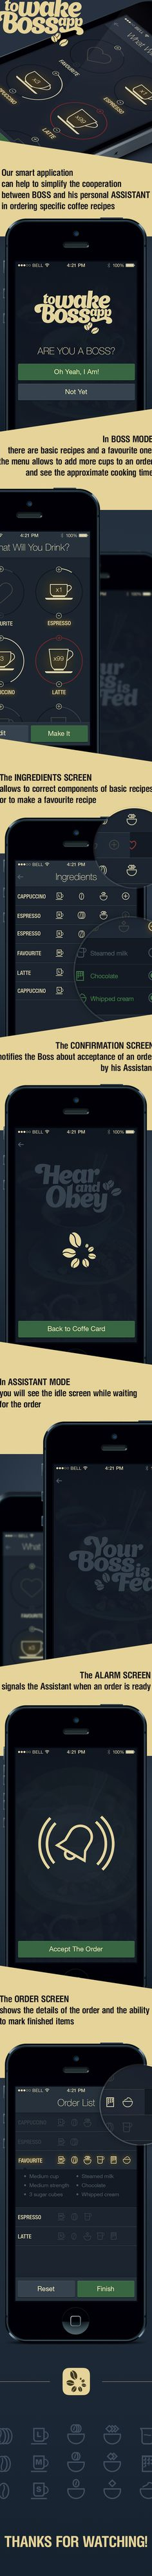 To Wake Boss App on Behance